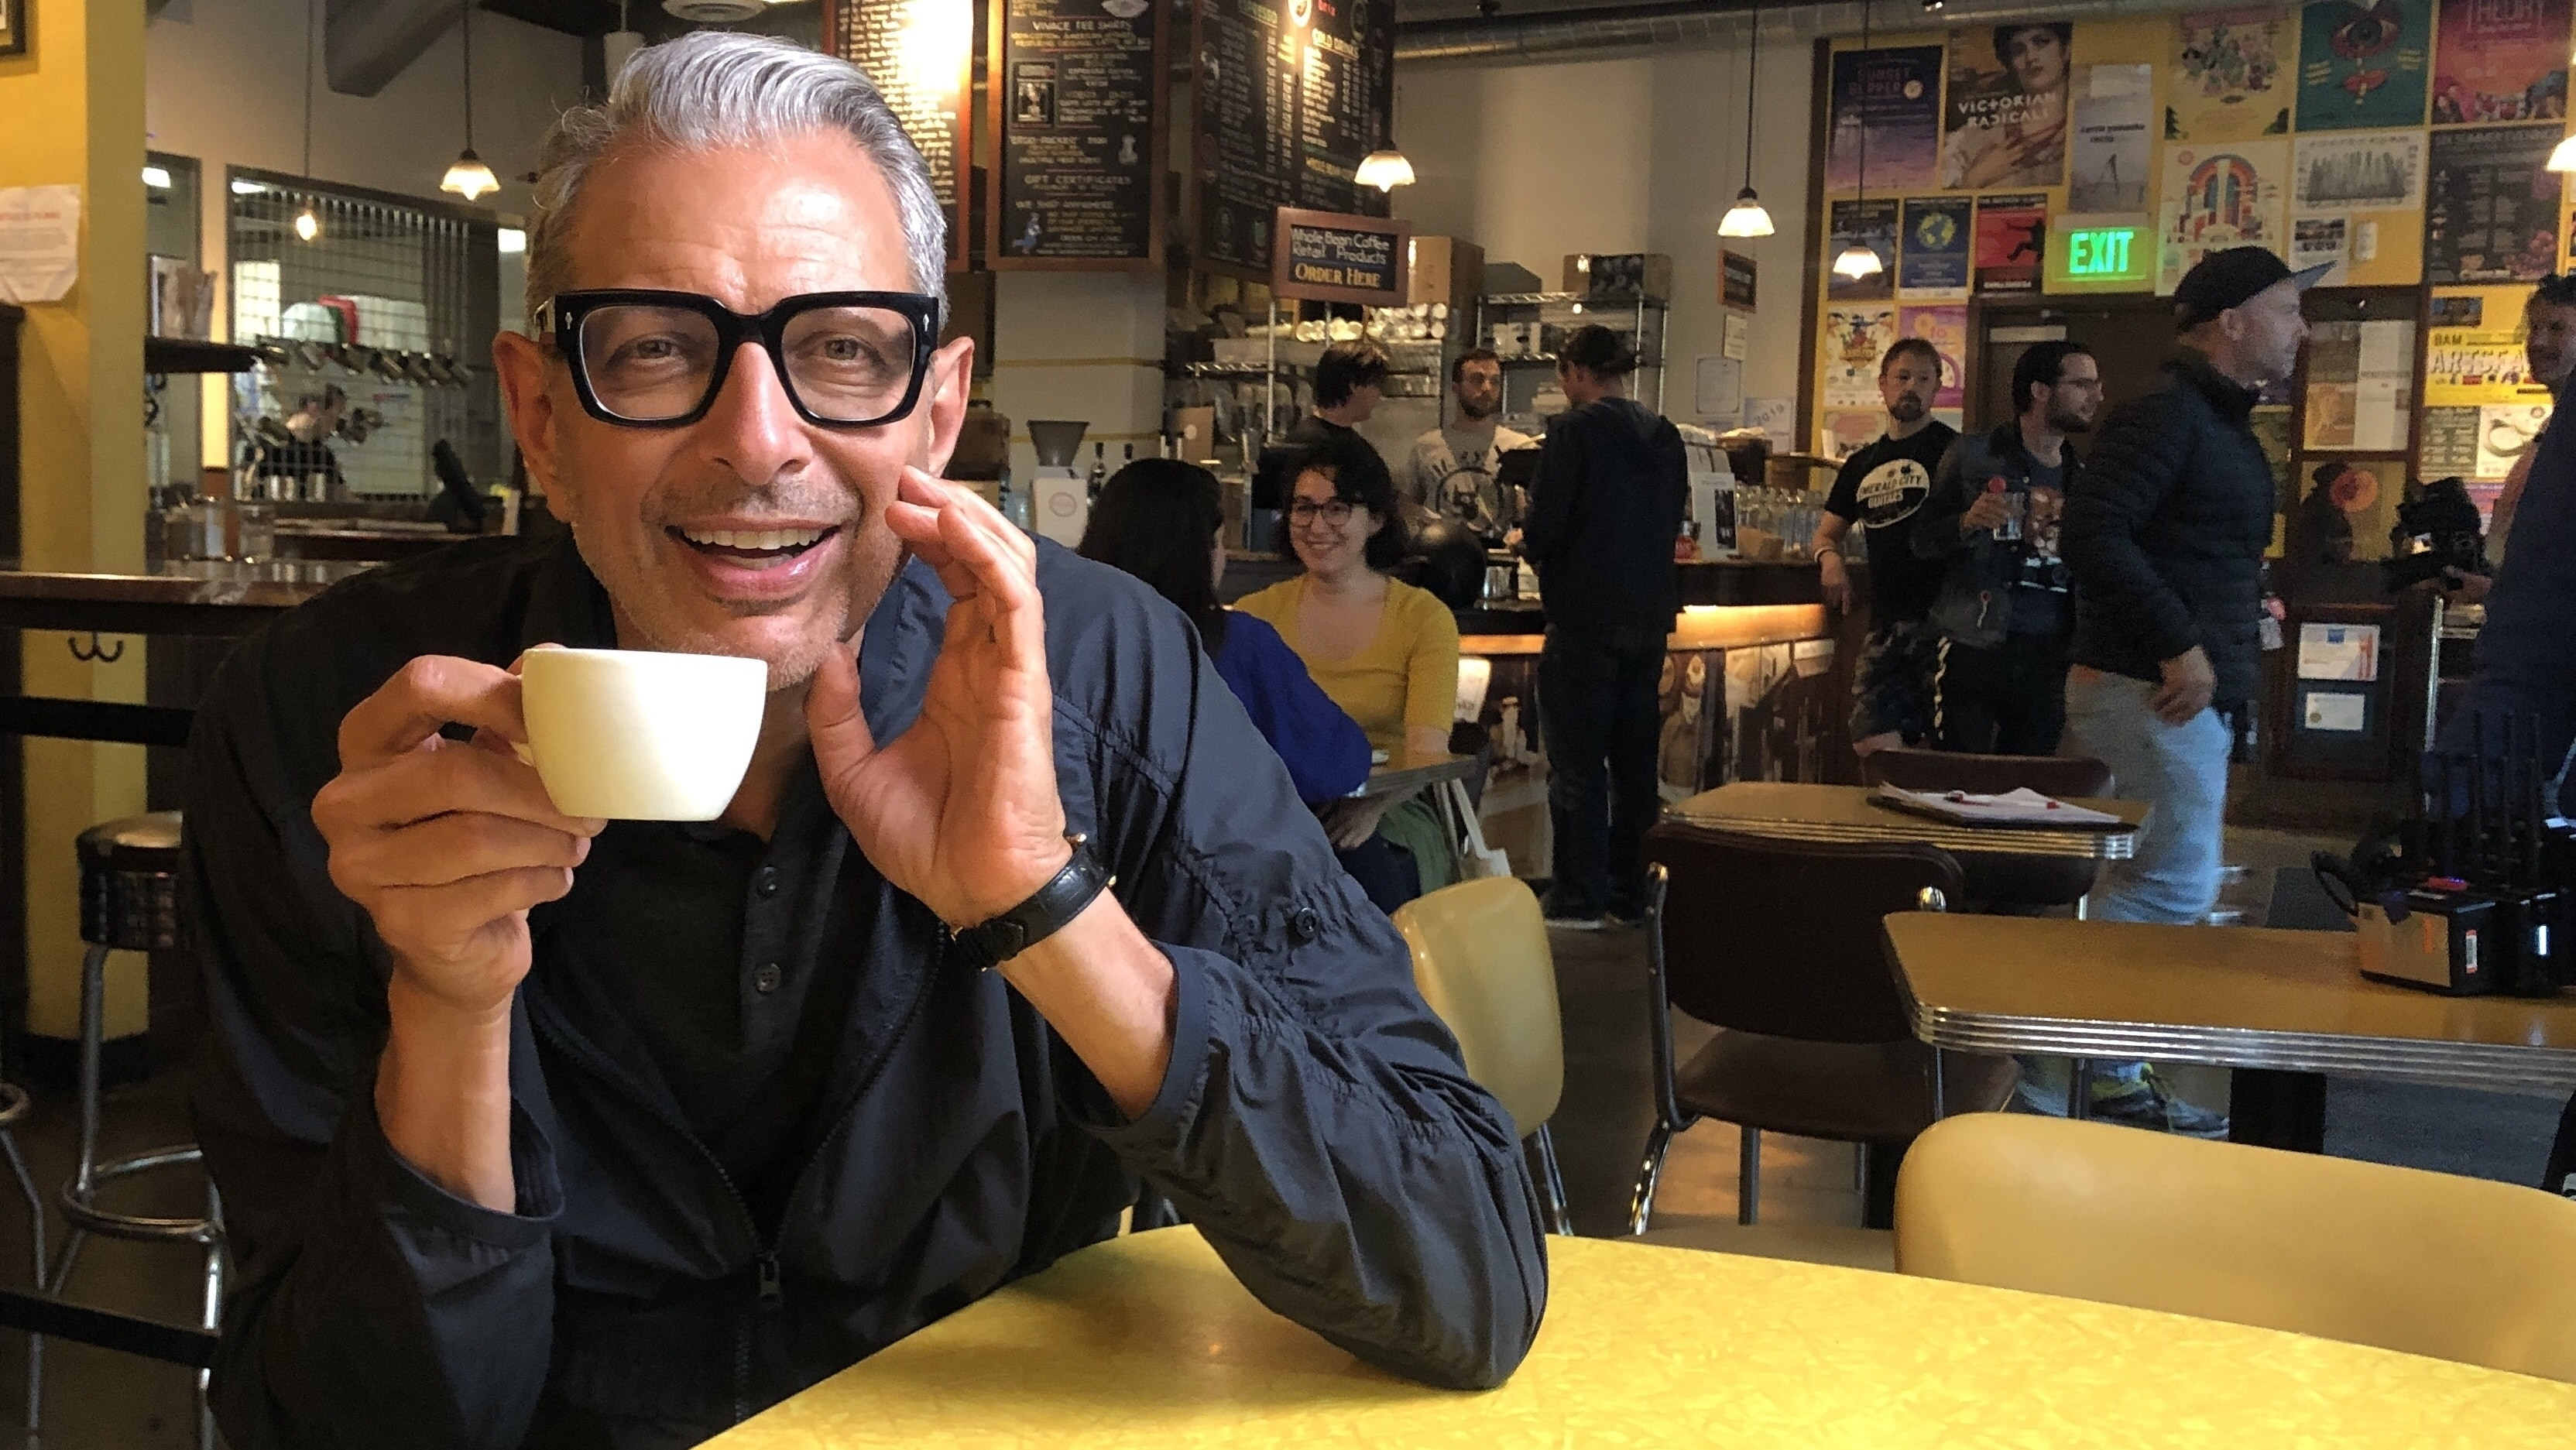 El-mundo-según-Jeff-Goldblum-café